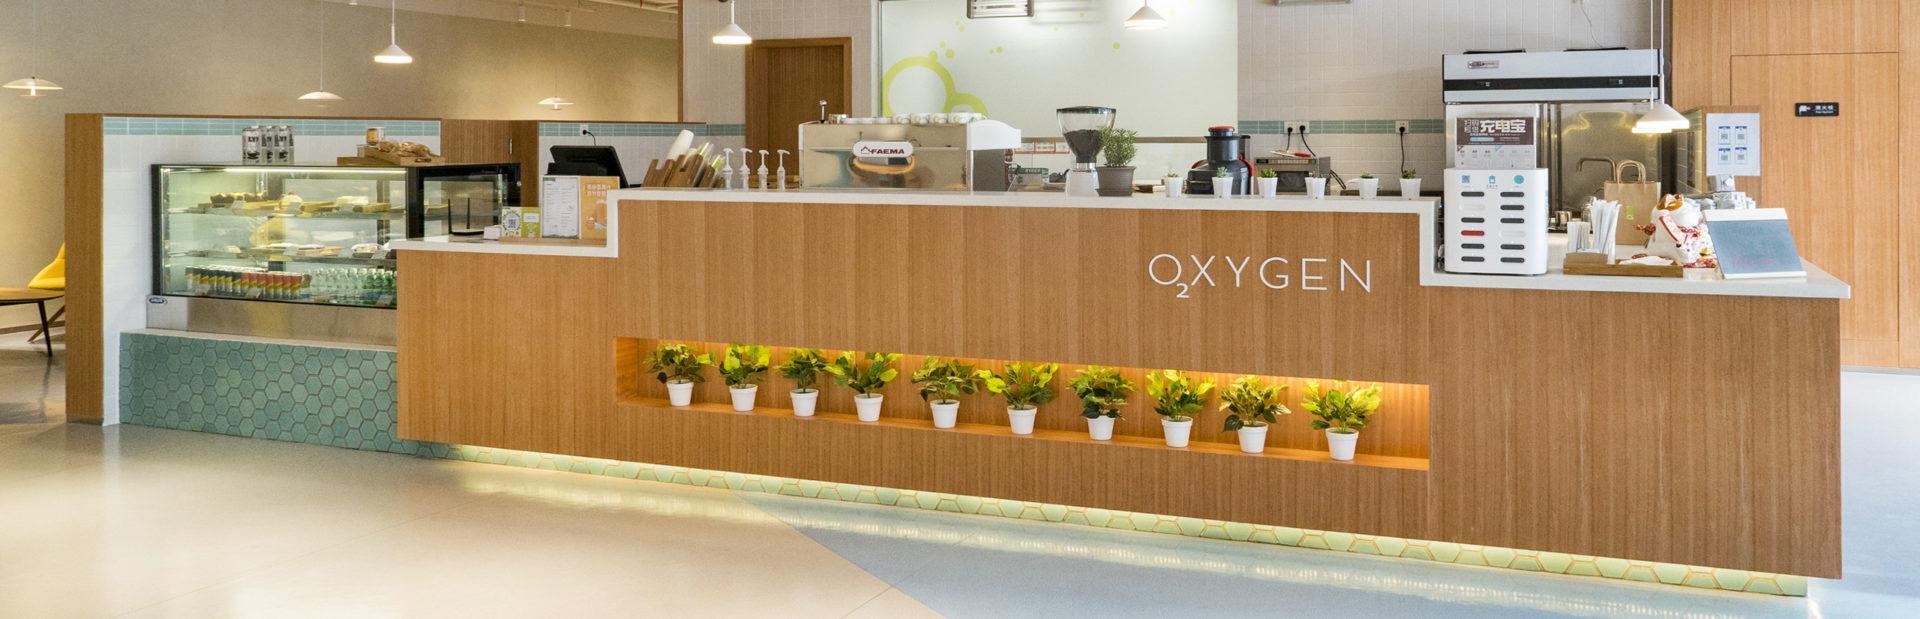 workplace café food service solutions